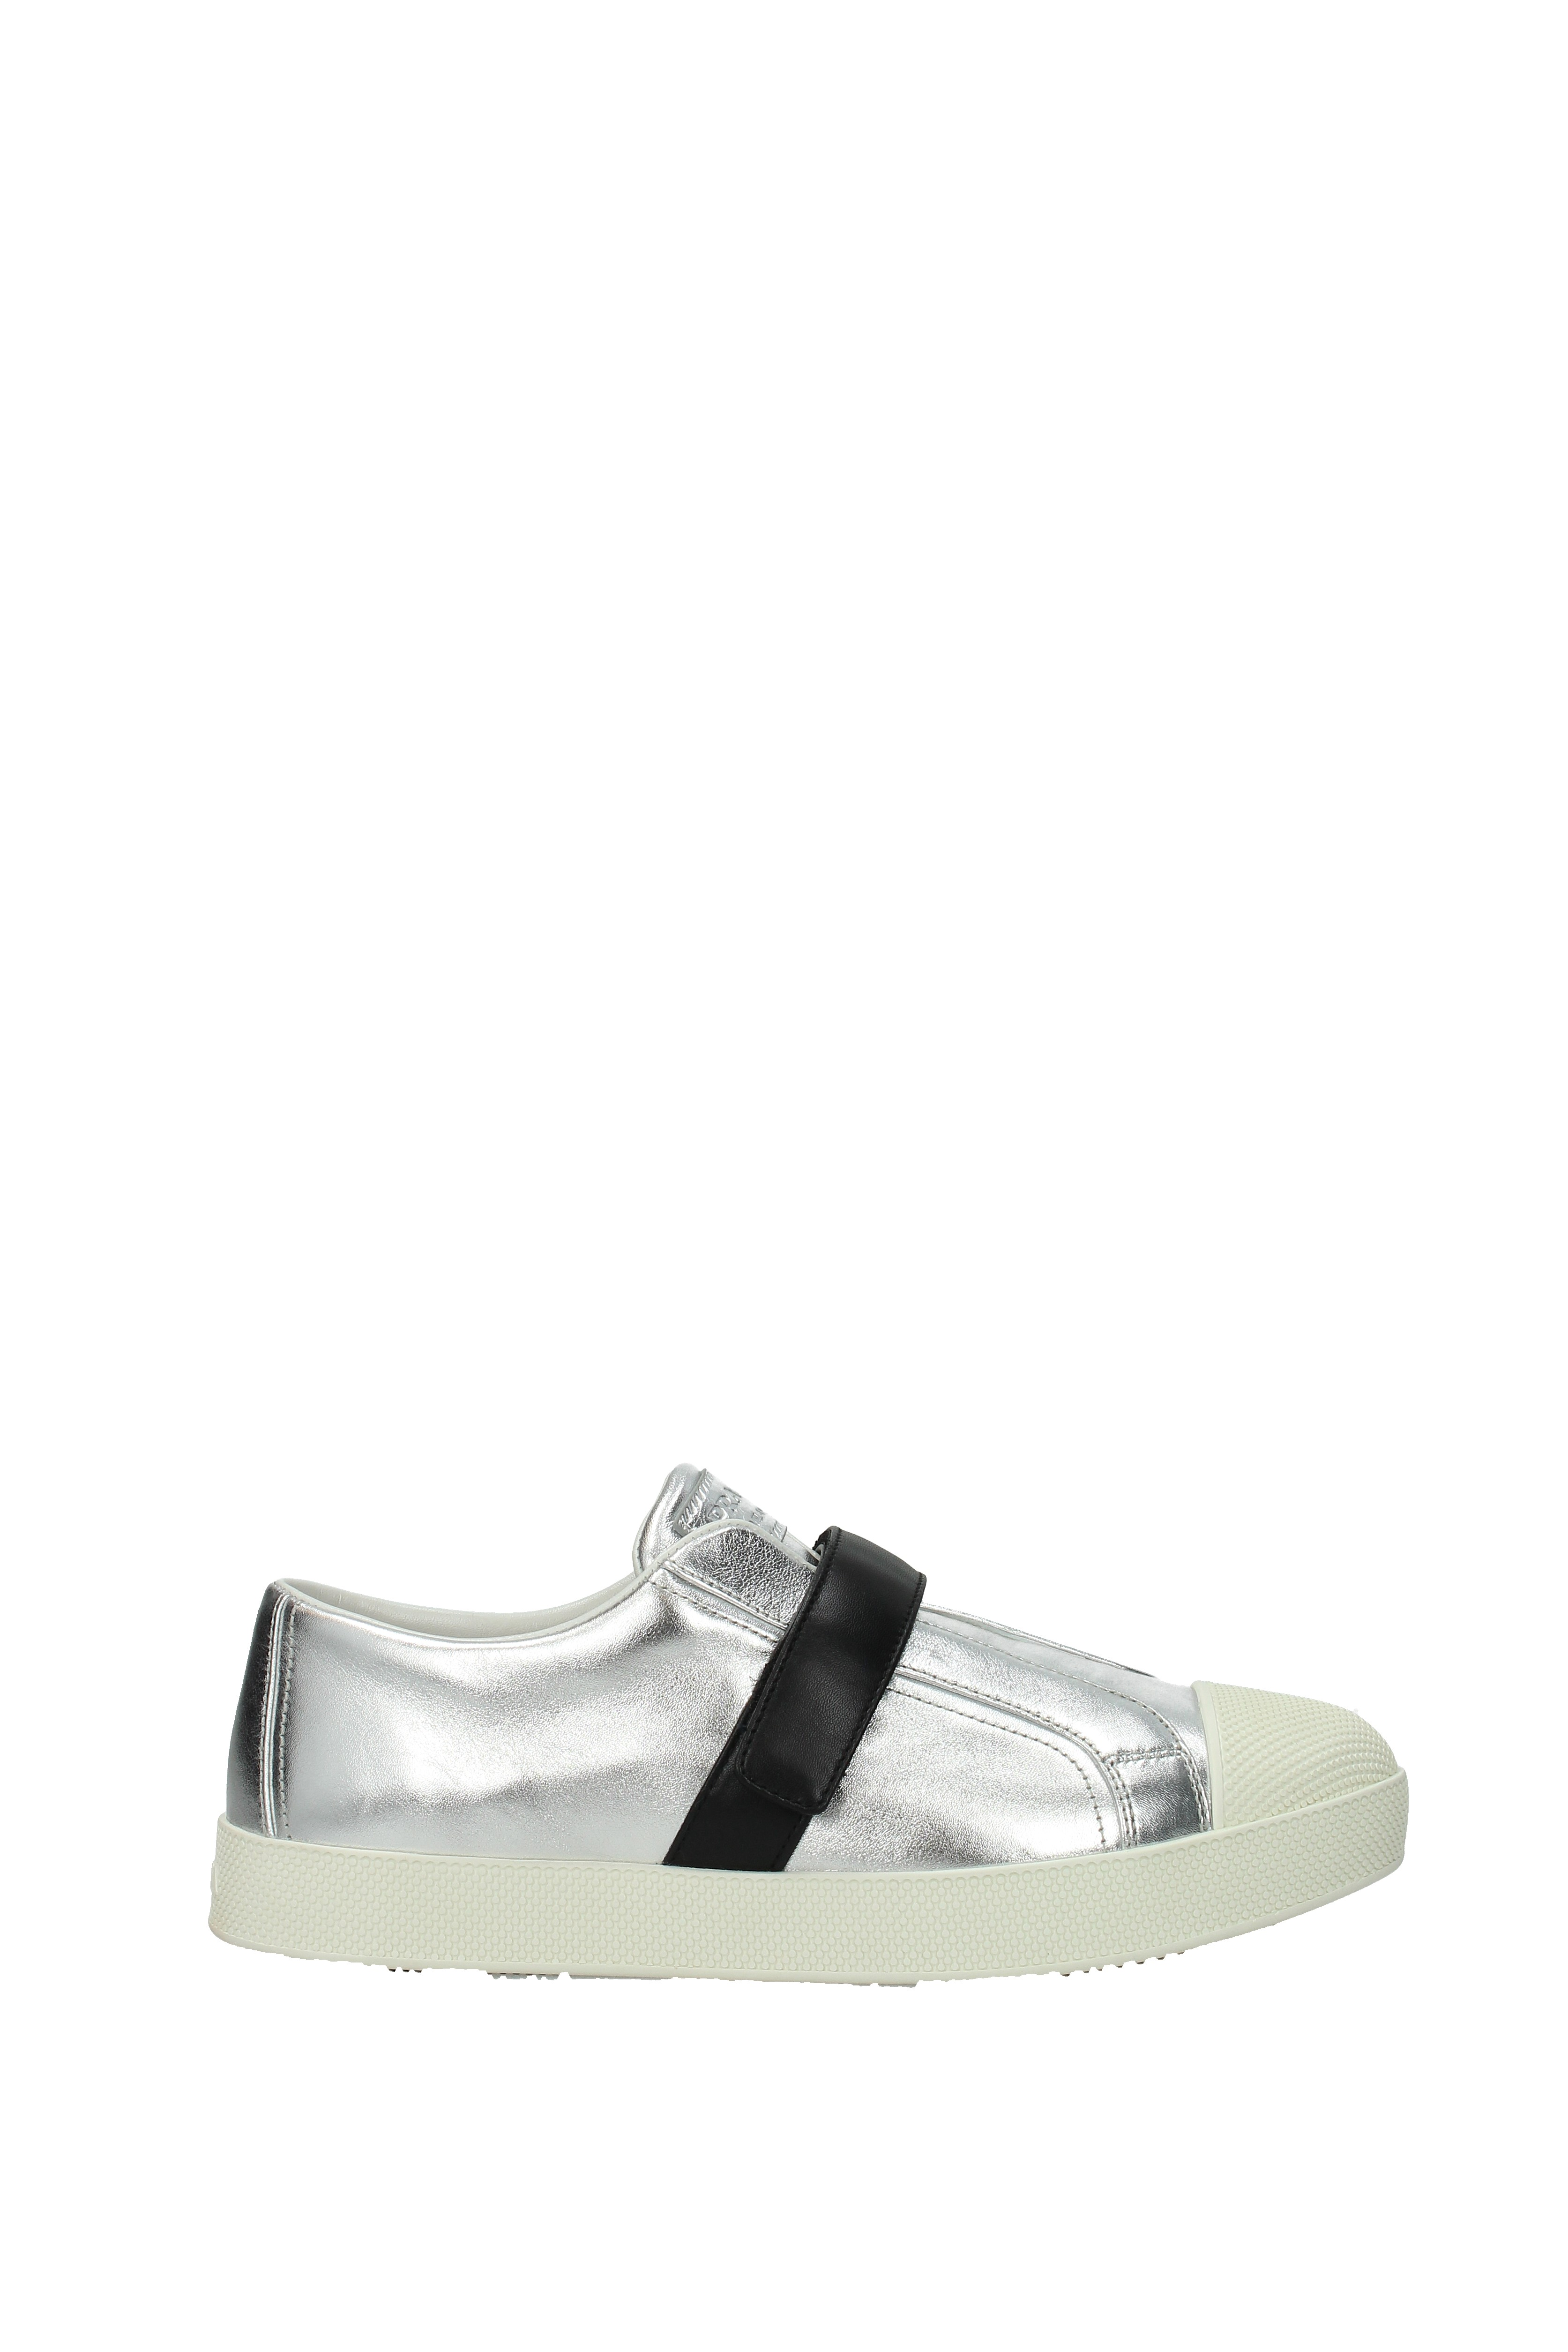 Sneakers-Prada-Women-Leather-3E6274